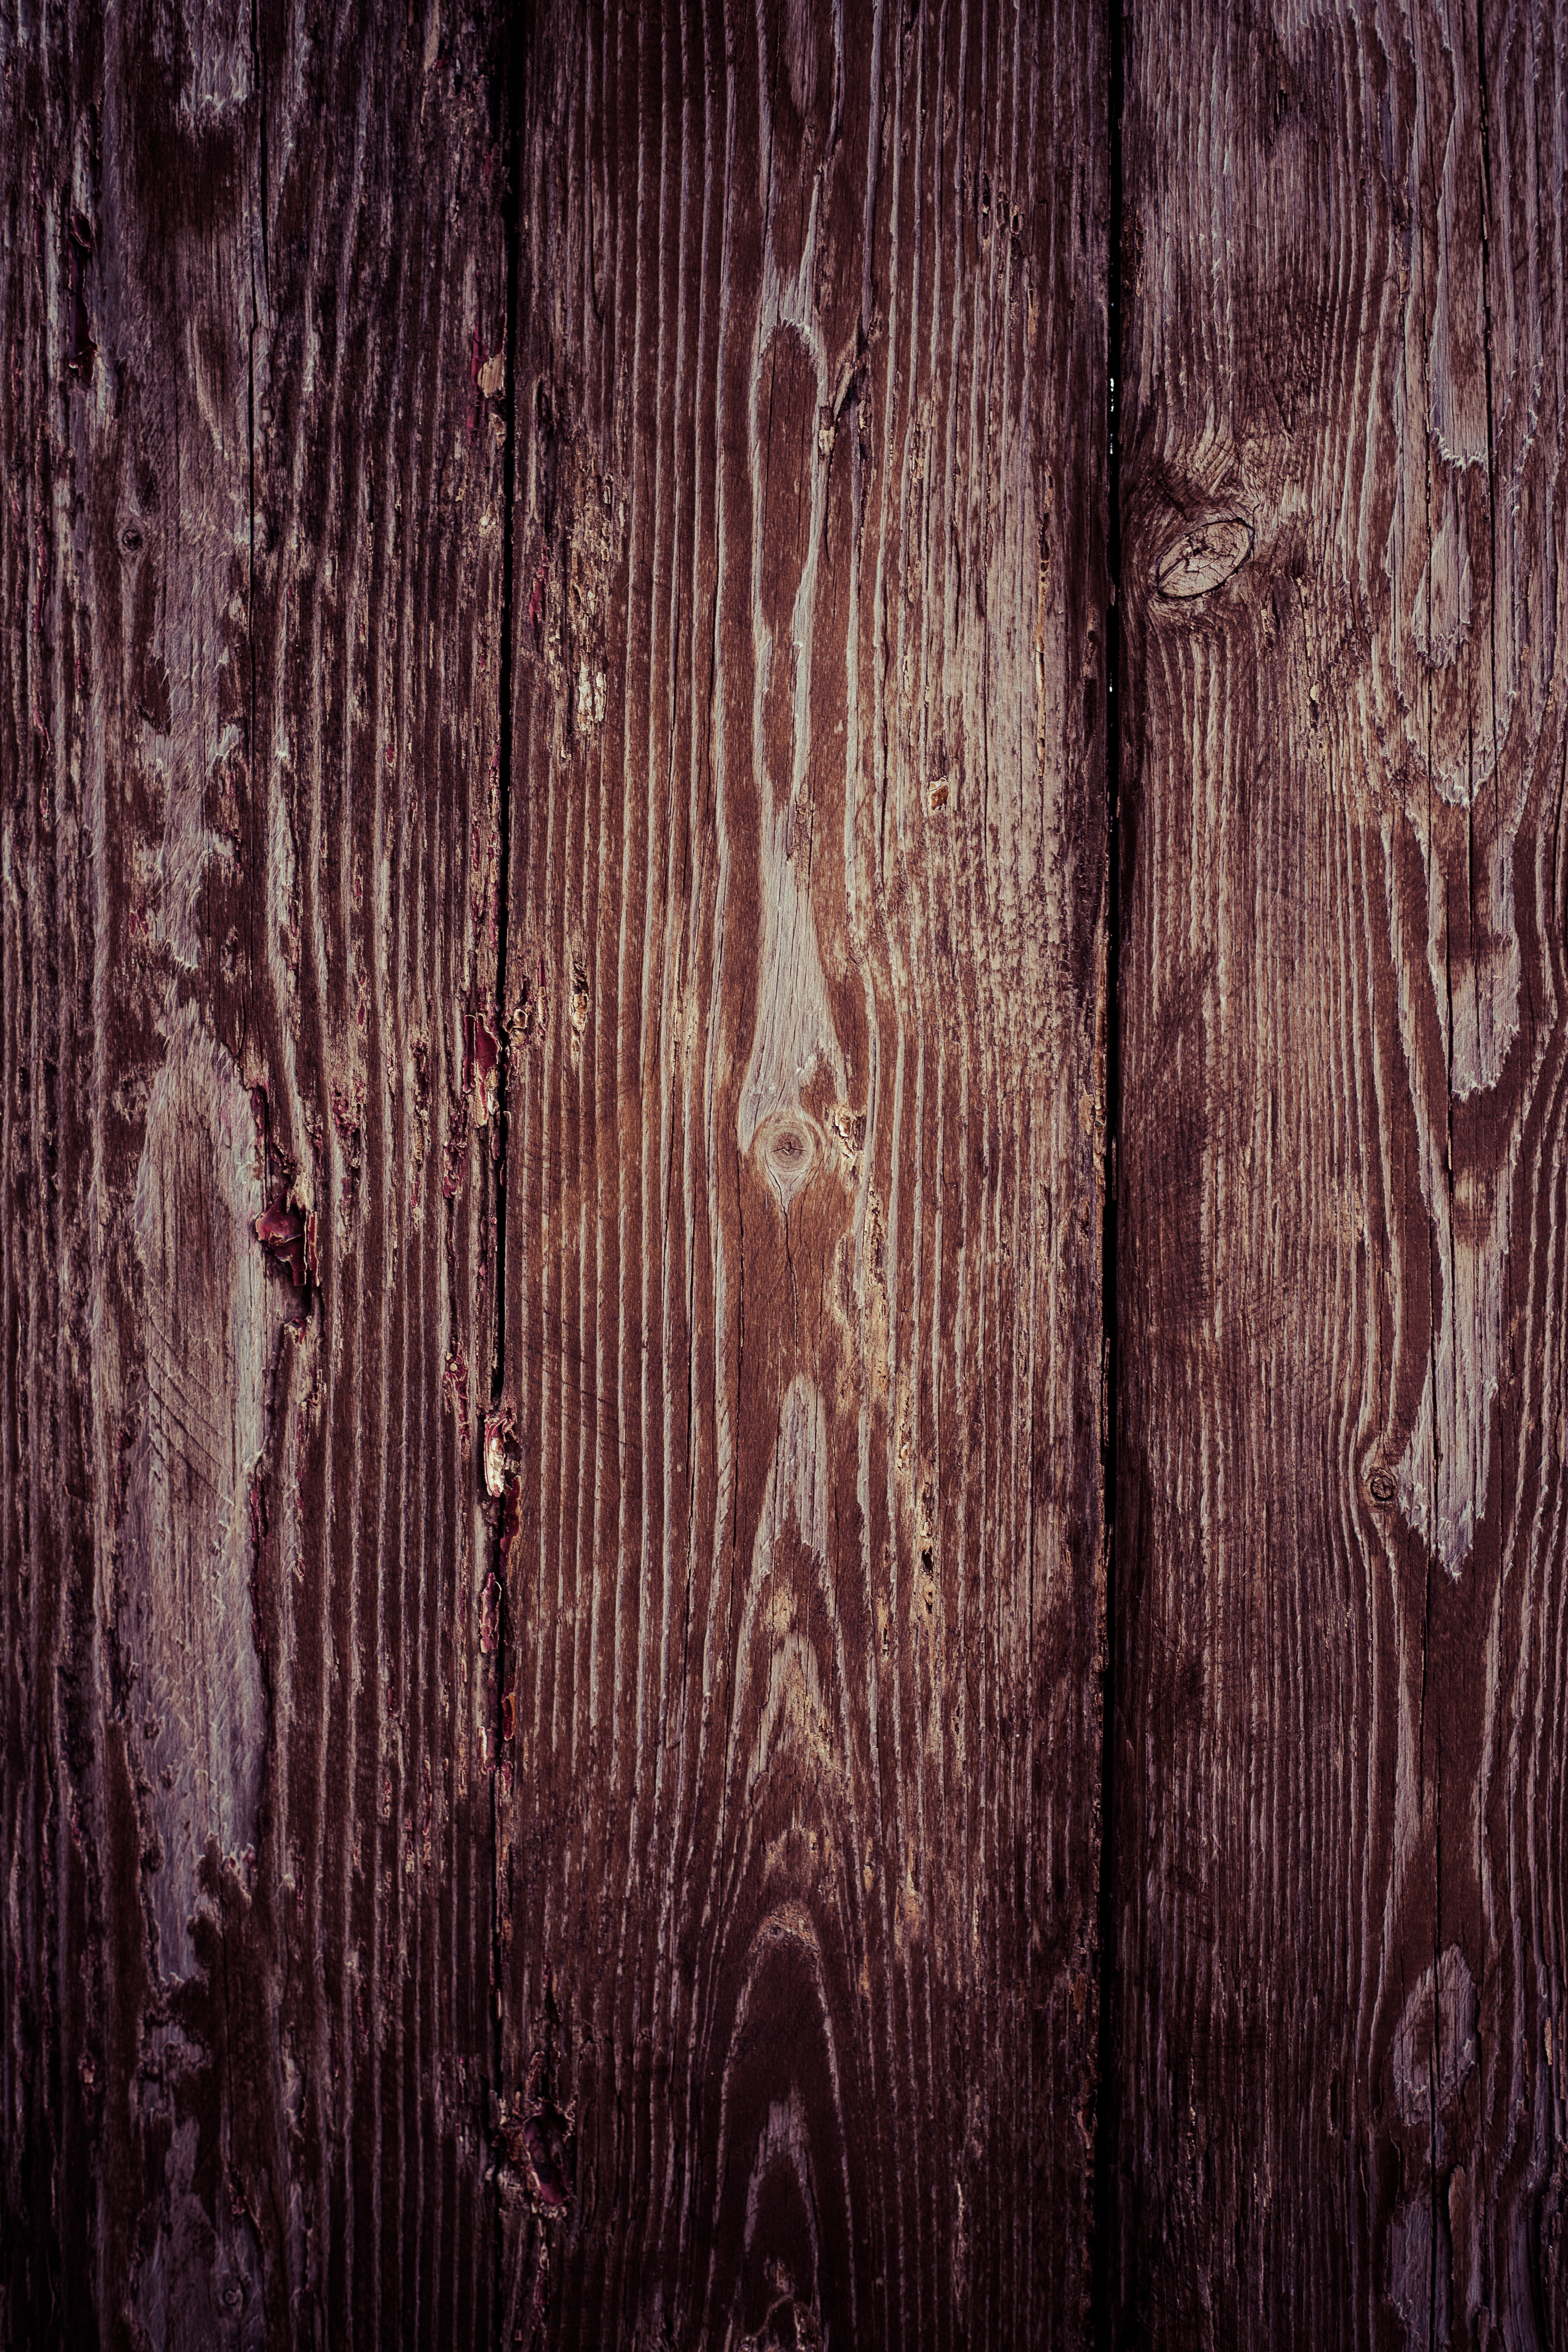 Old Wood Background, Dark, Gloomy, Grunge, Grungy, HQ Photo